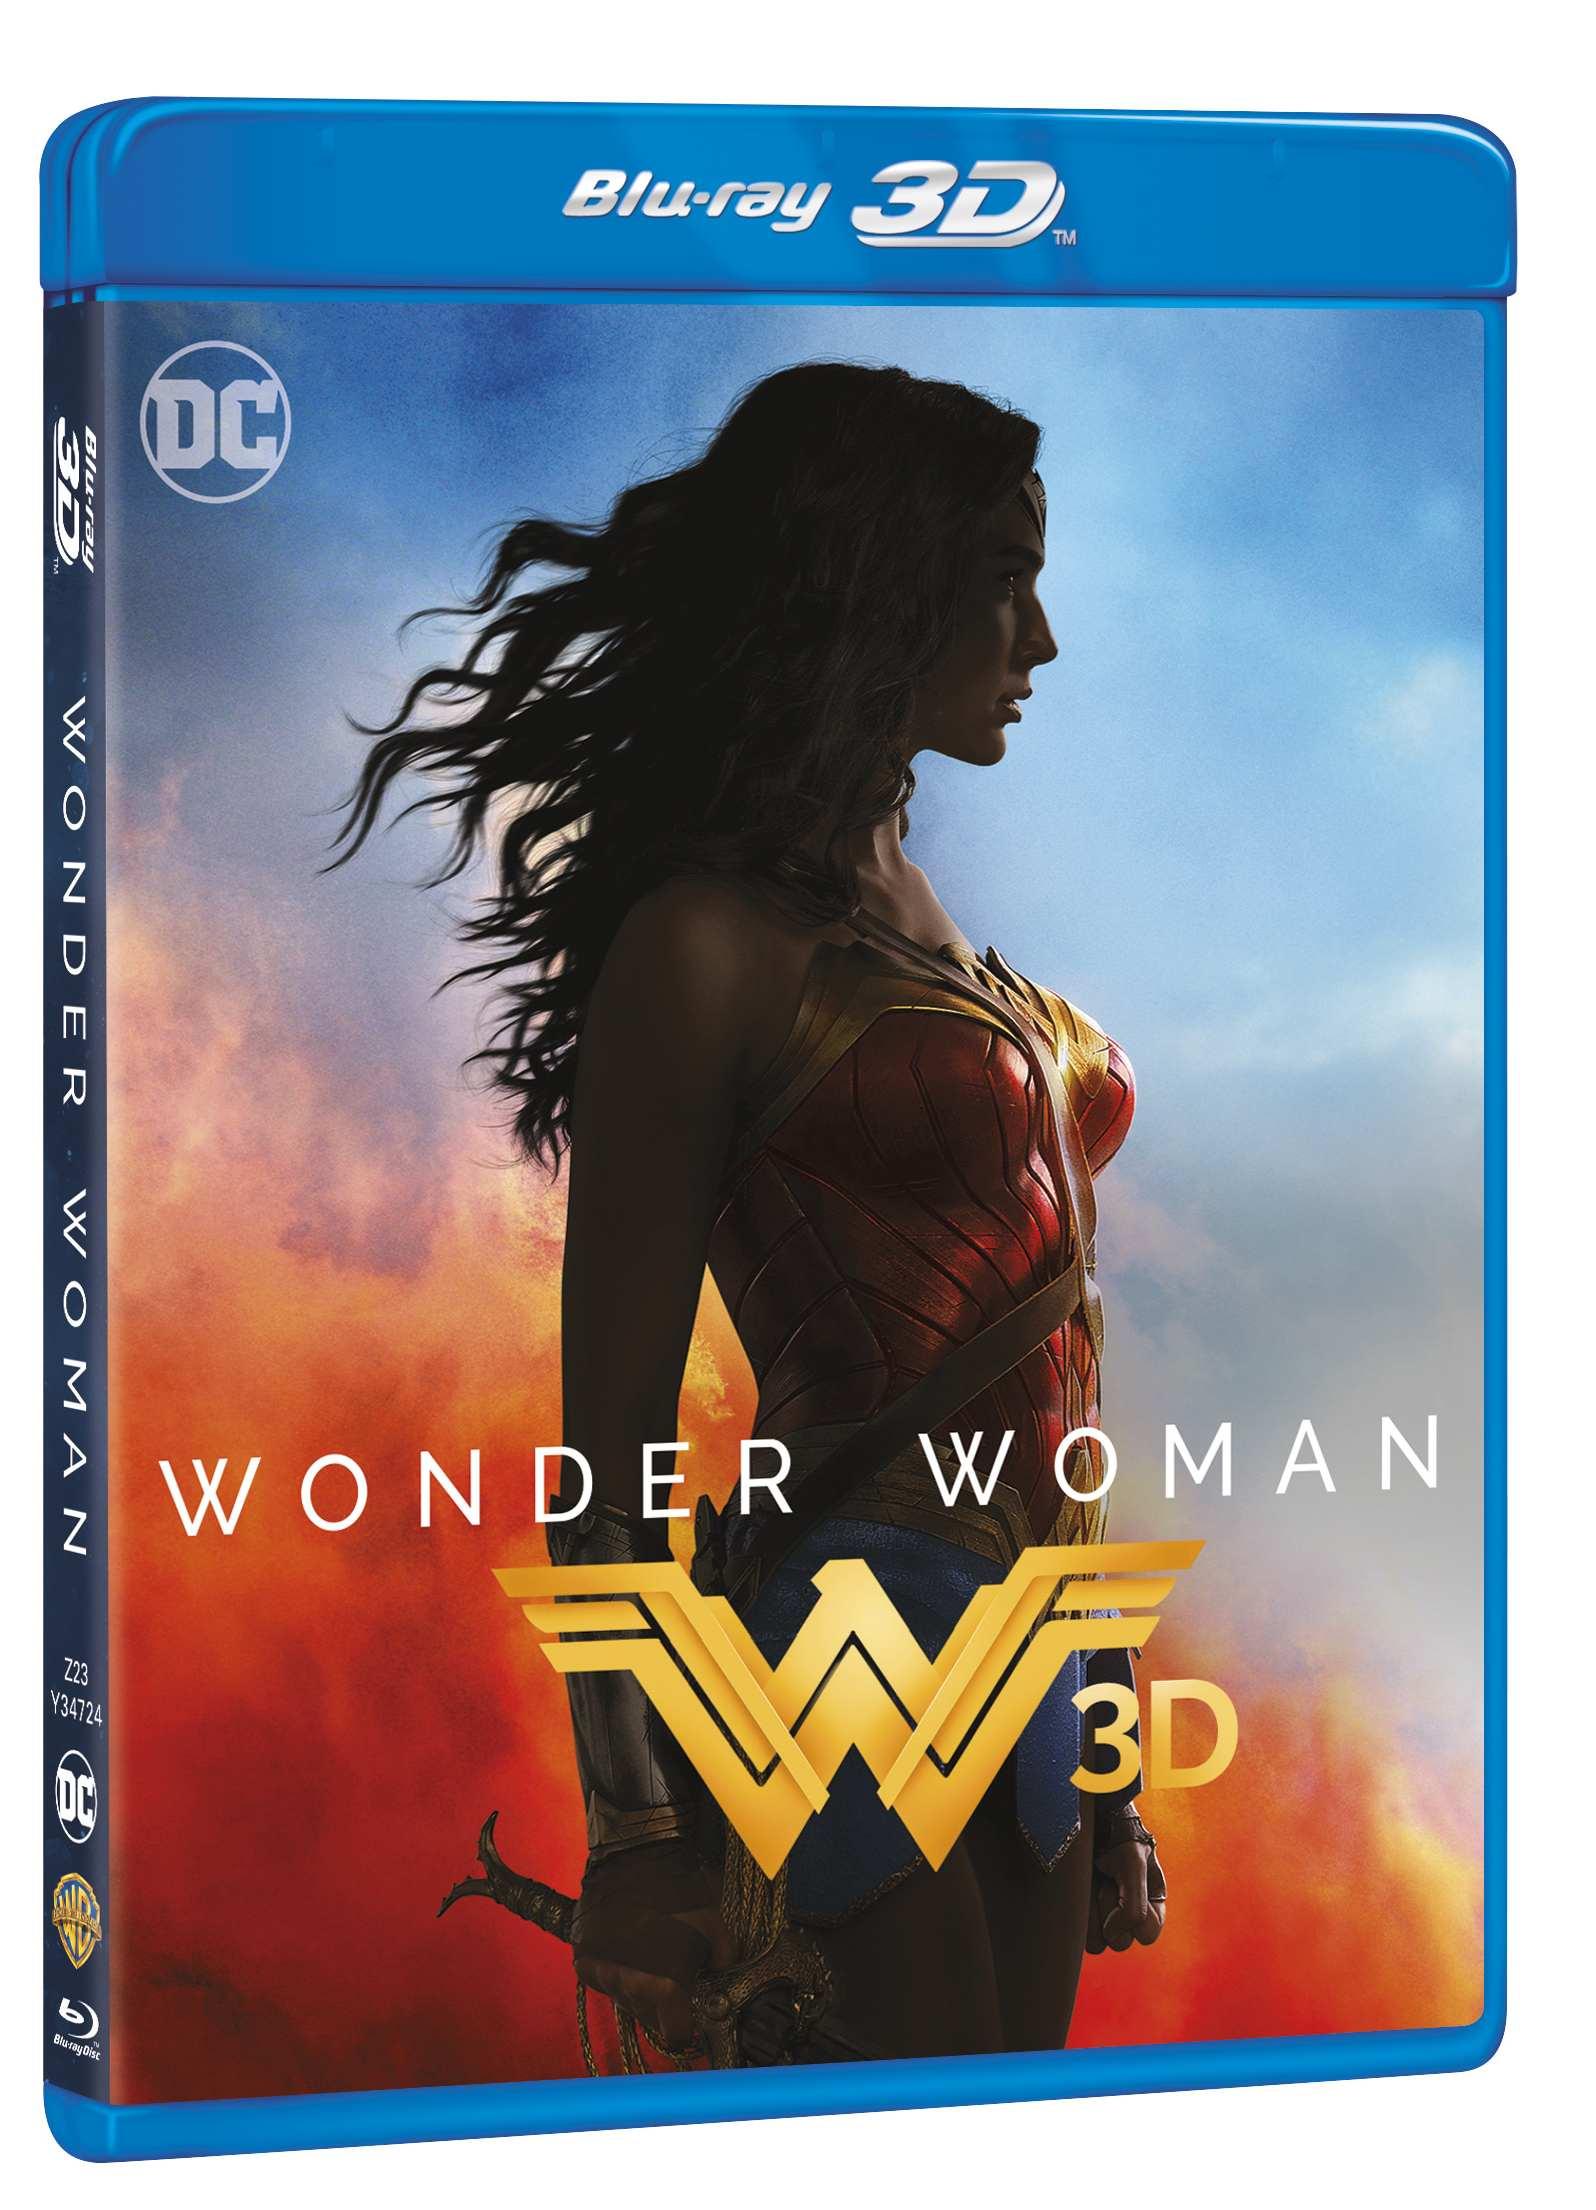 WONDER WOMAN - Blu-ray 3D + 2D